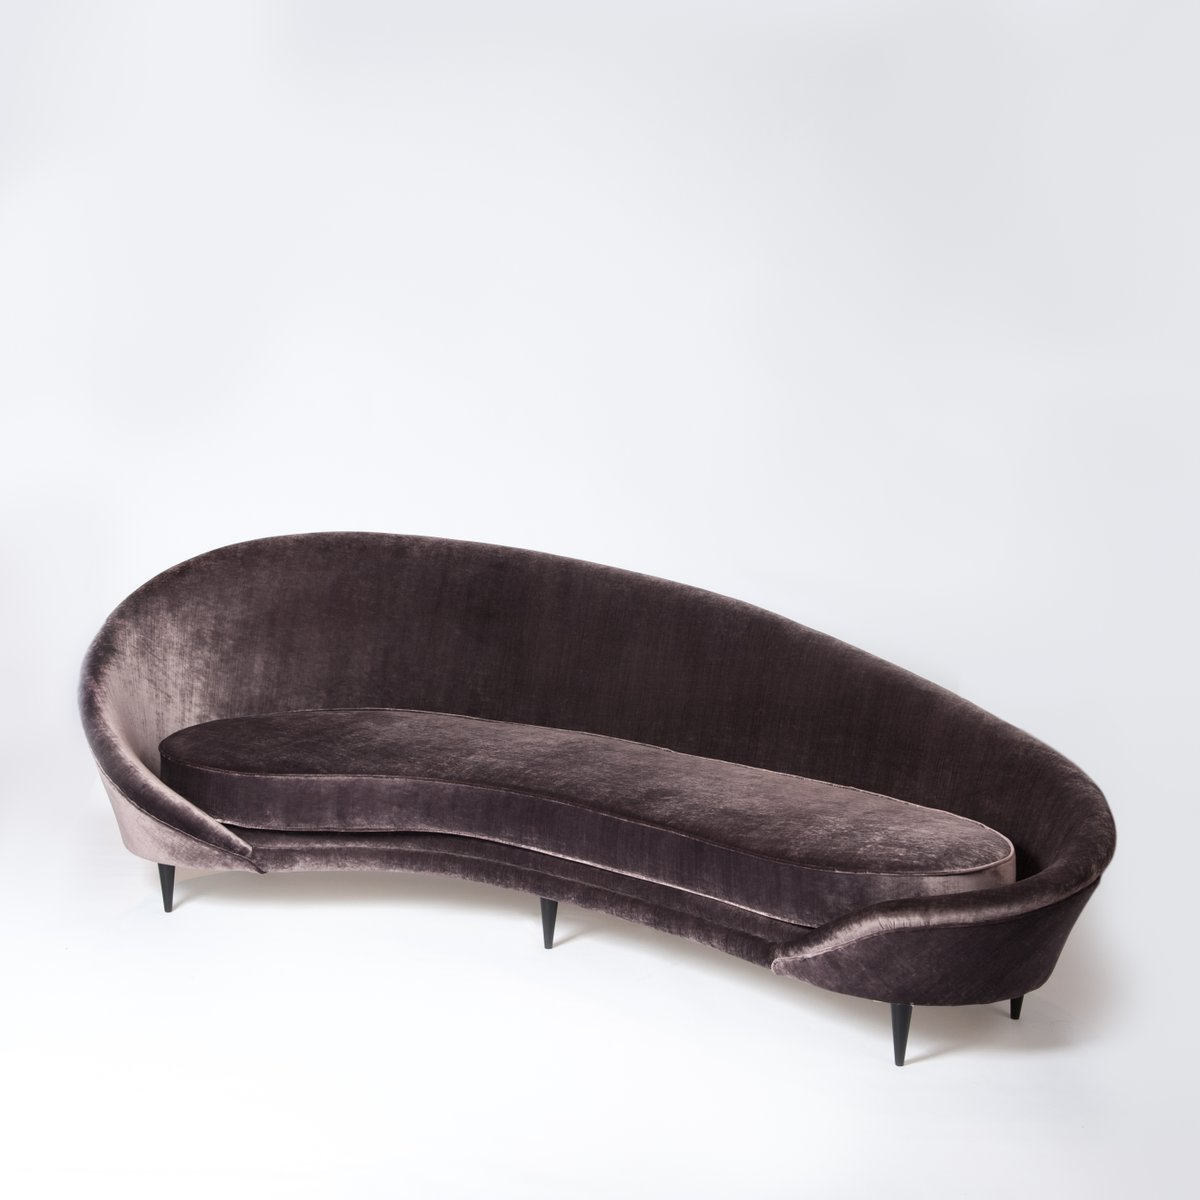 Vintage Curved Sofa by Federico Munari 1960s for sale at  : vintage curved sofa by federico munari 1960s 2 from www.pamono.com size 1200 x 1200 jpeg 52kB